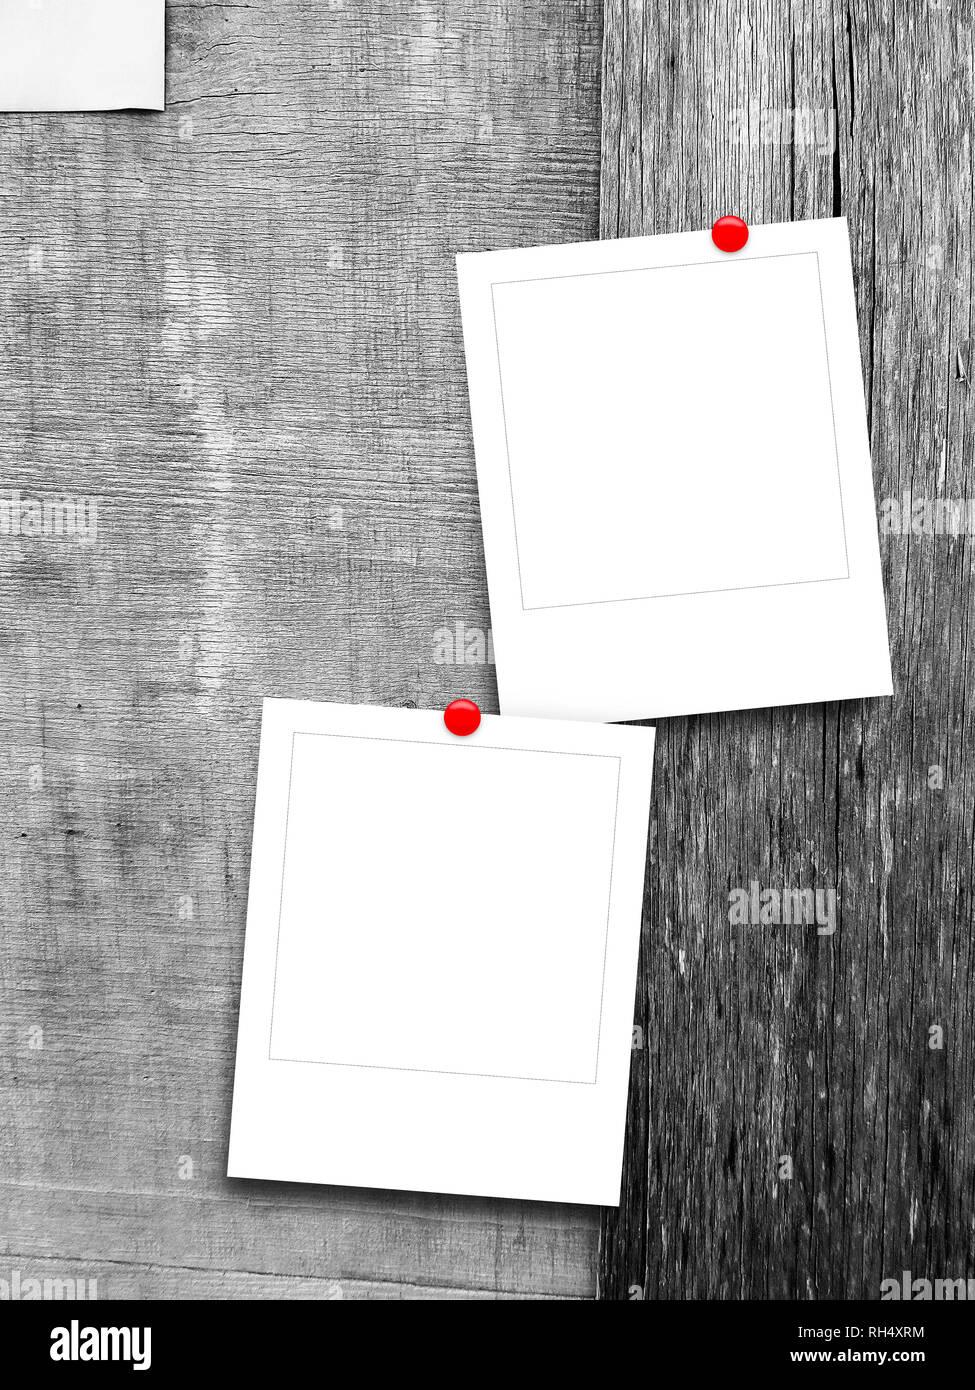 Zwei leere Quadrat instant Bilderrahmen gegen Grau zerkratzt Holzbretter Hintergrund Stockbild